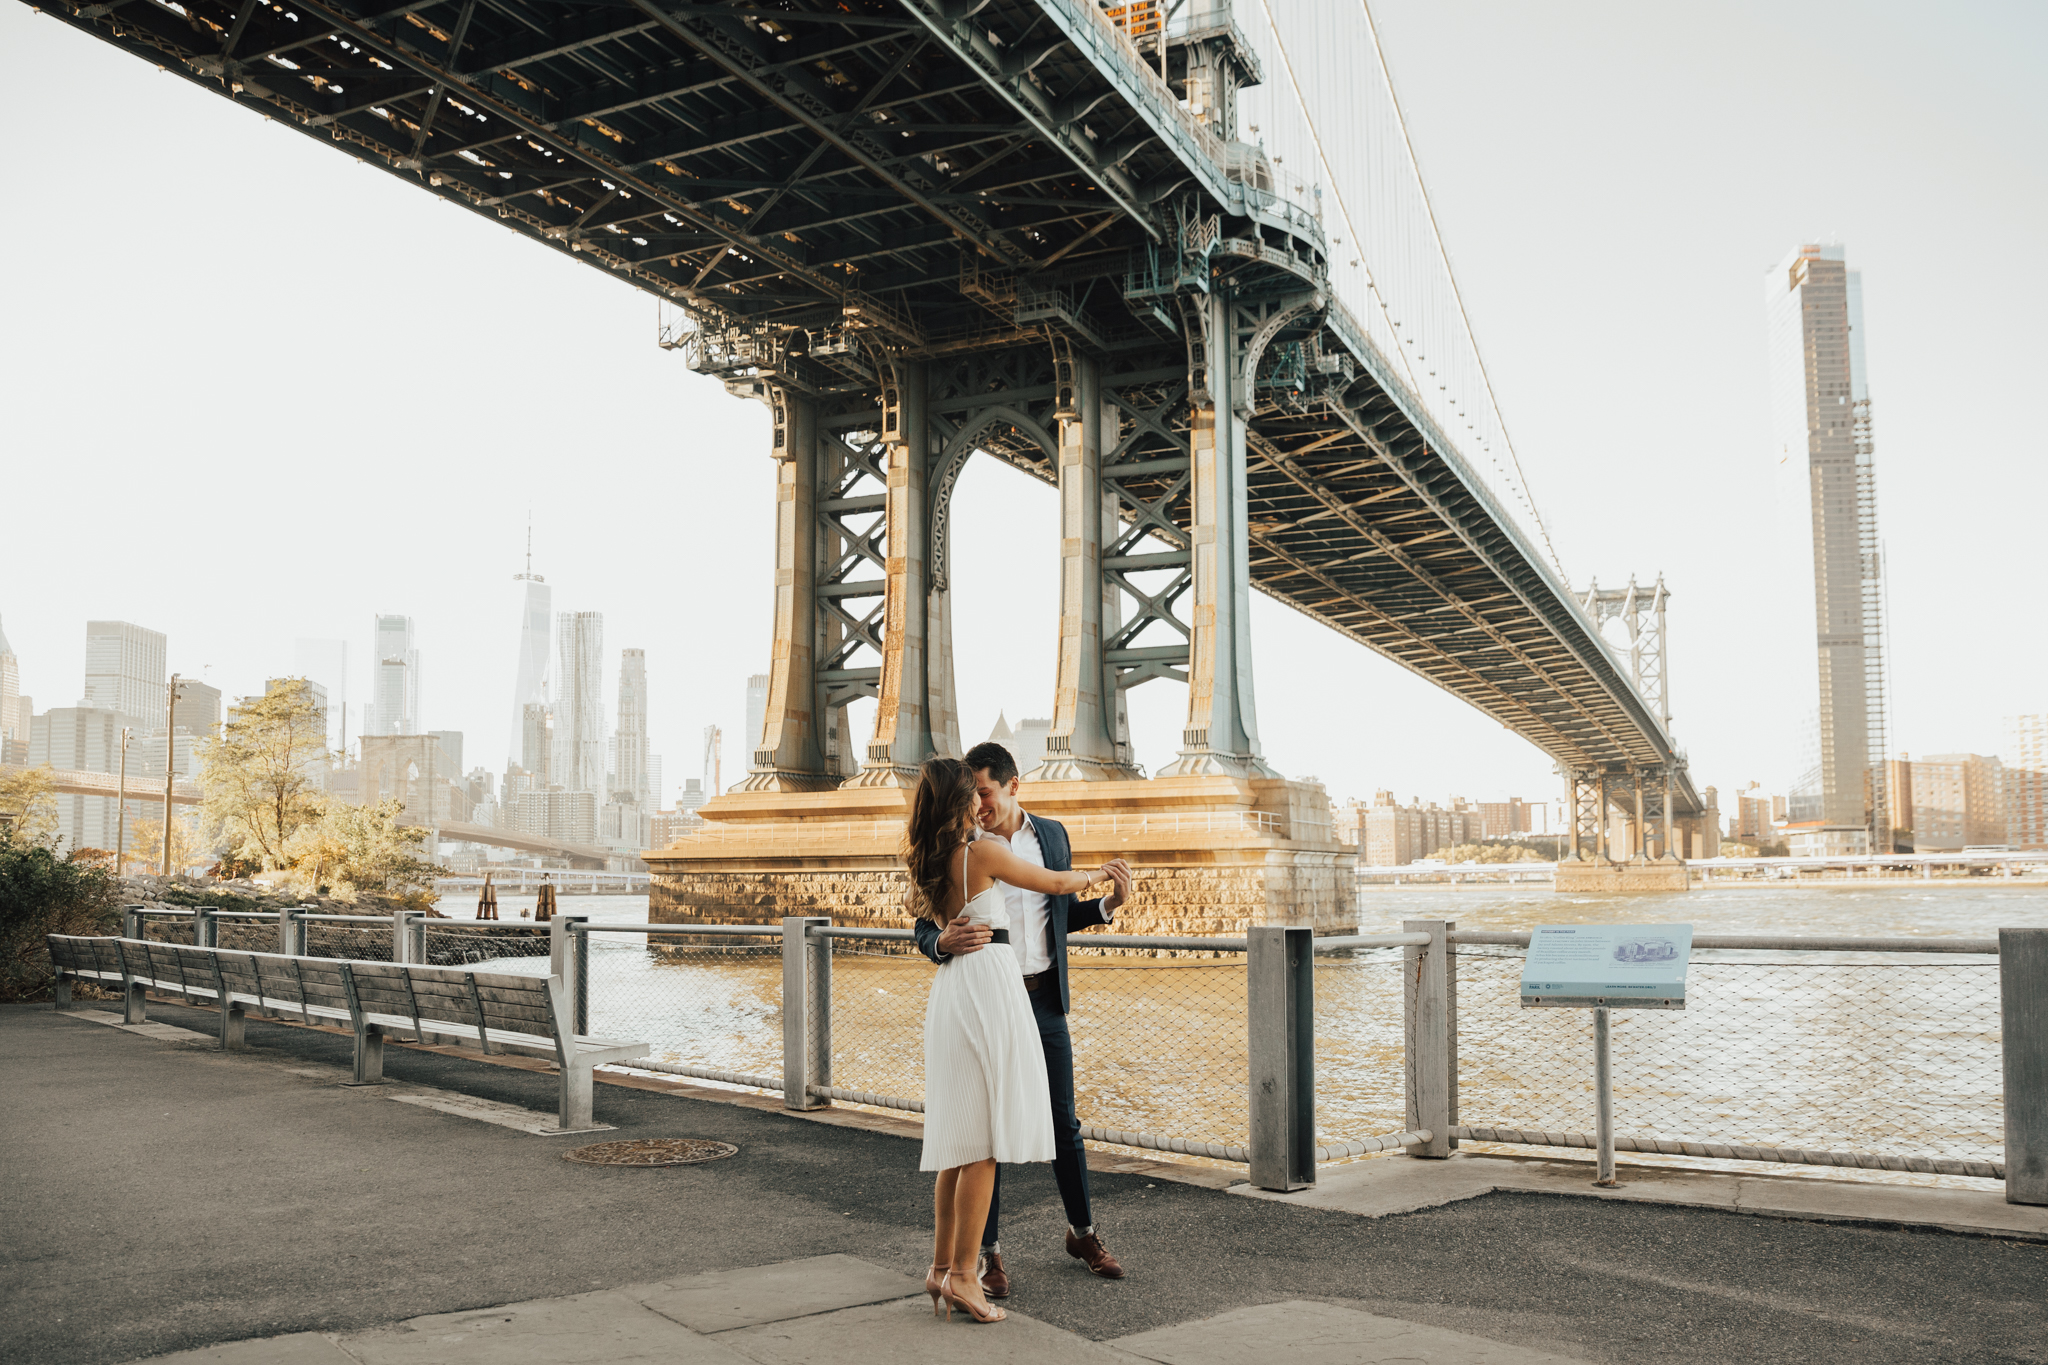 brooklyn engagement photoshoot